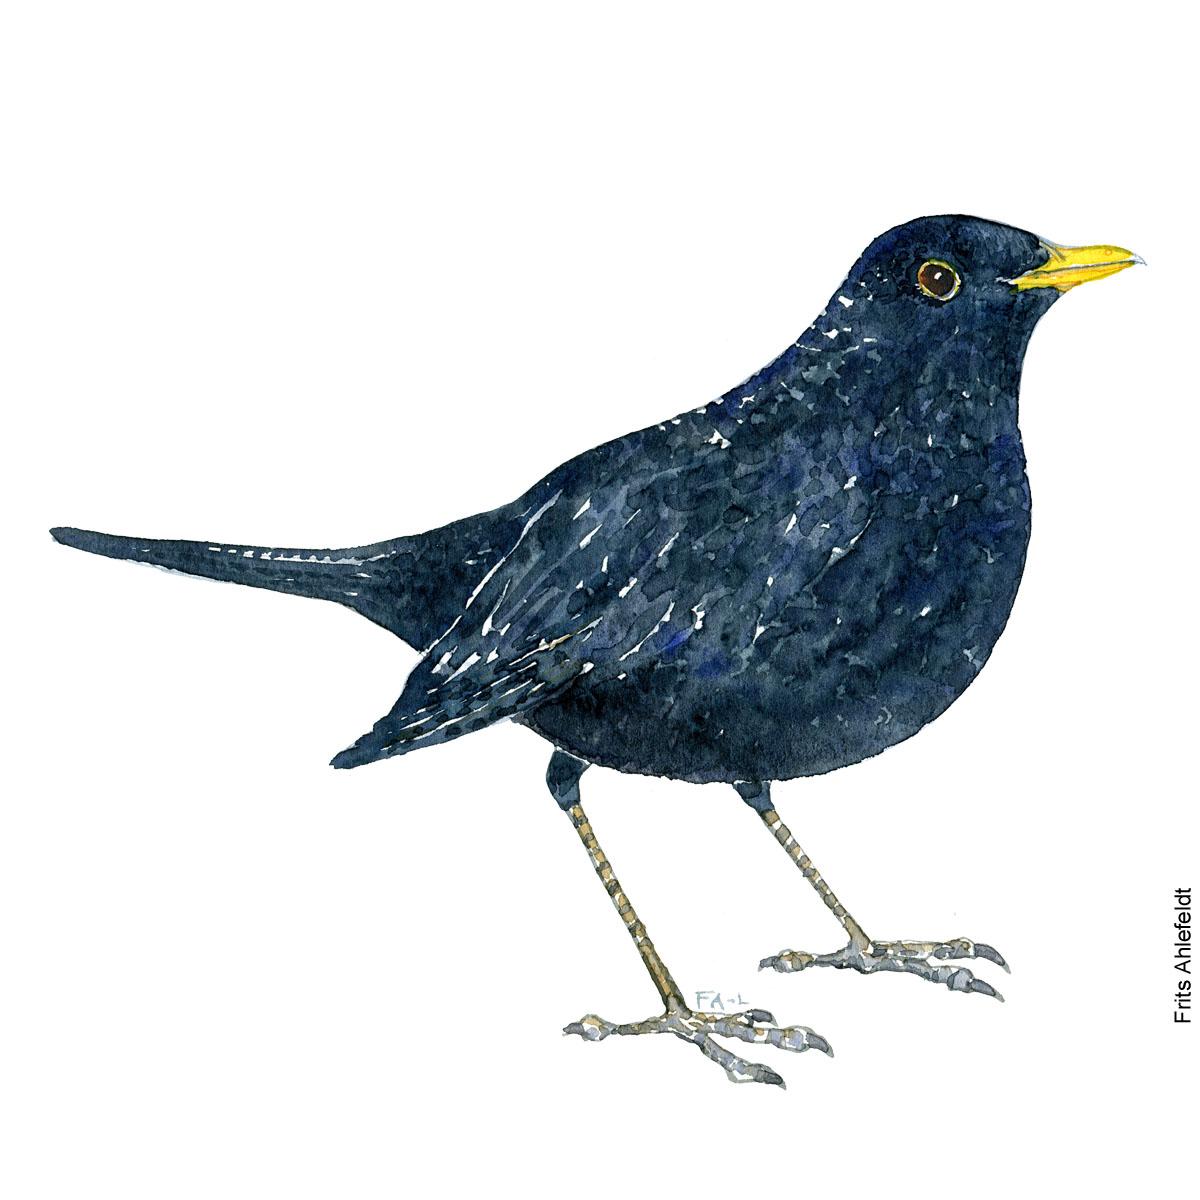 Solsort - Blackbird bird watercolor painting. Artwork by Frits Ahlefeldt. Fugle akvarel